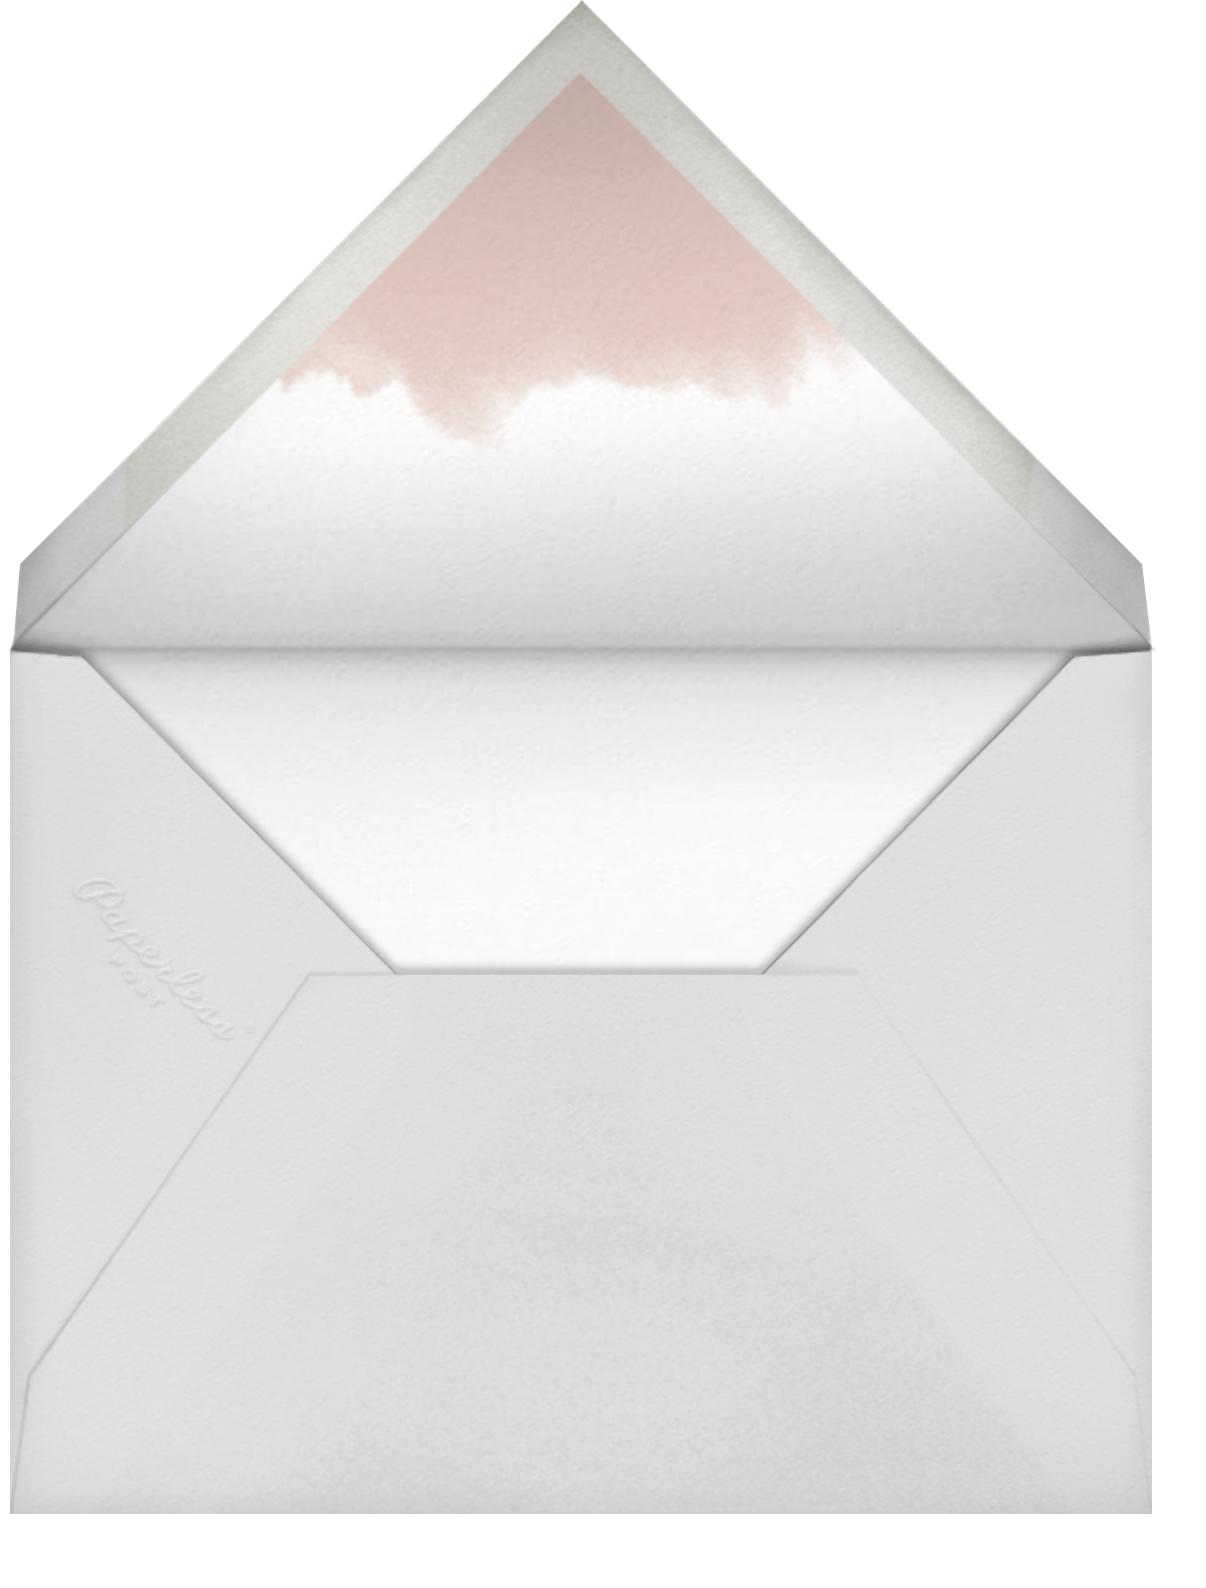 Evelina (Photo) - Caviar - Paperless Post - Photo  - envelope back